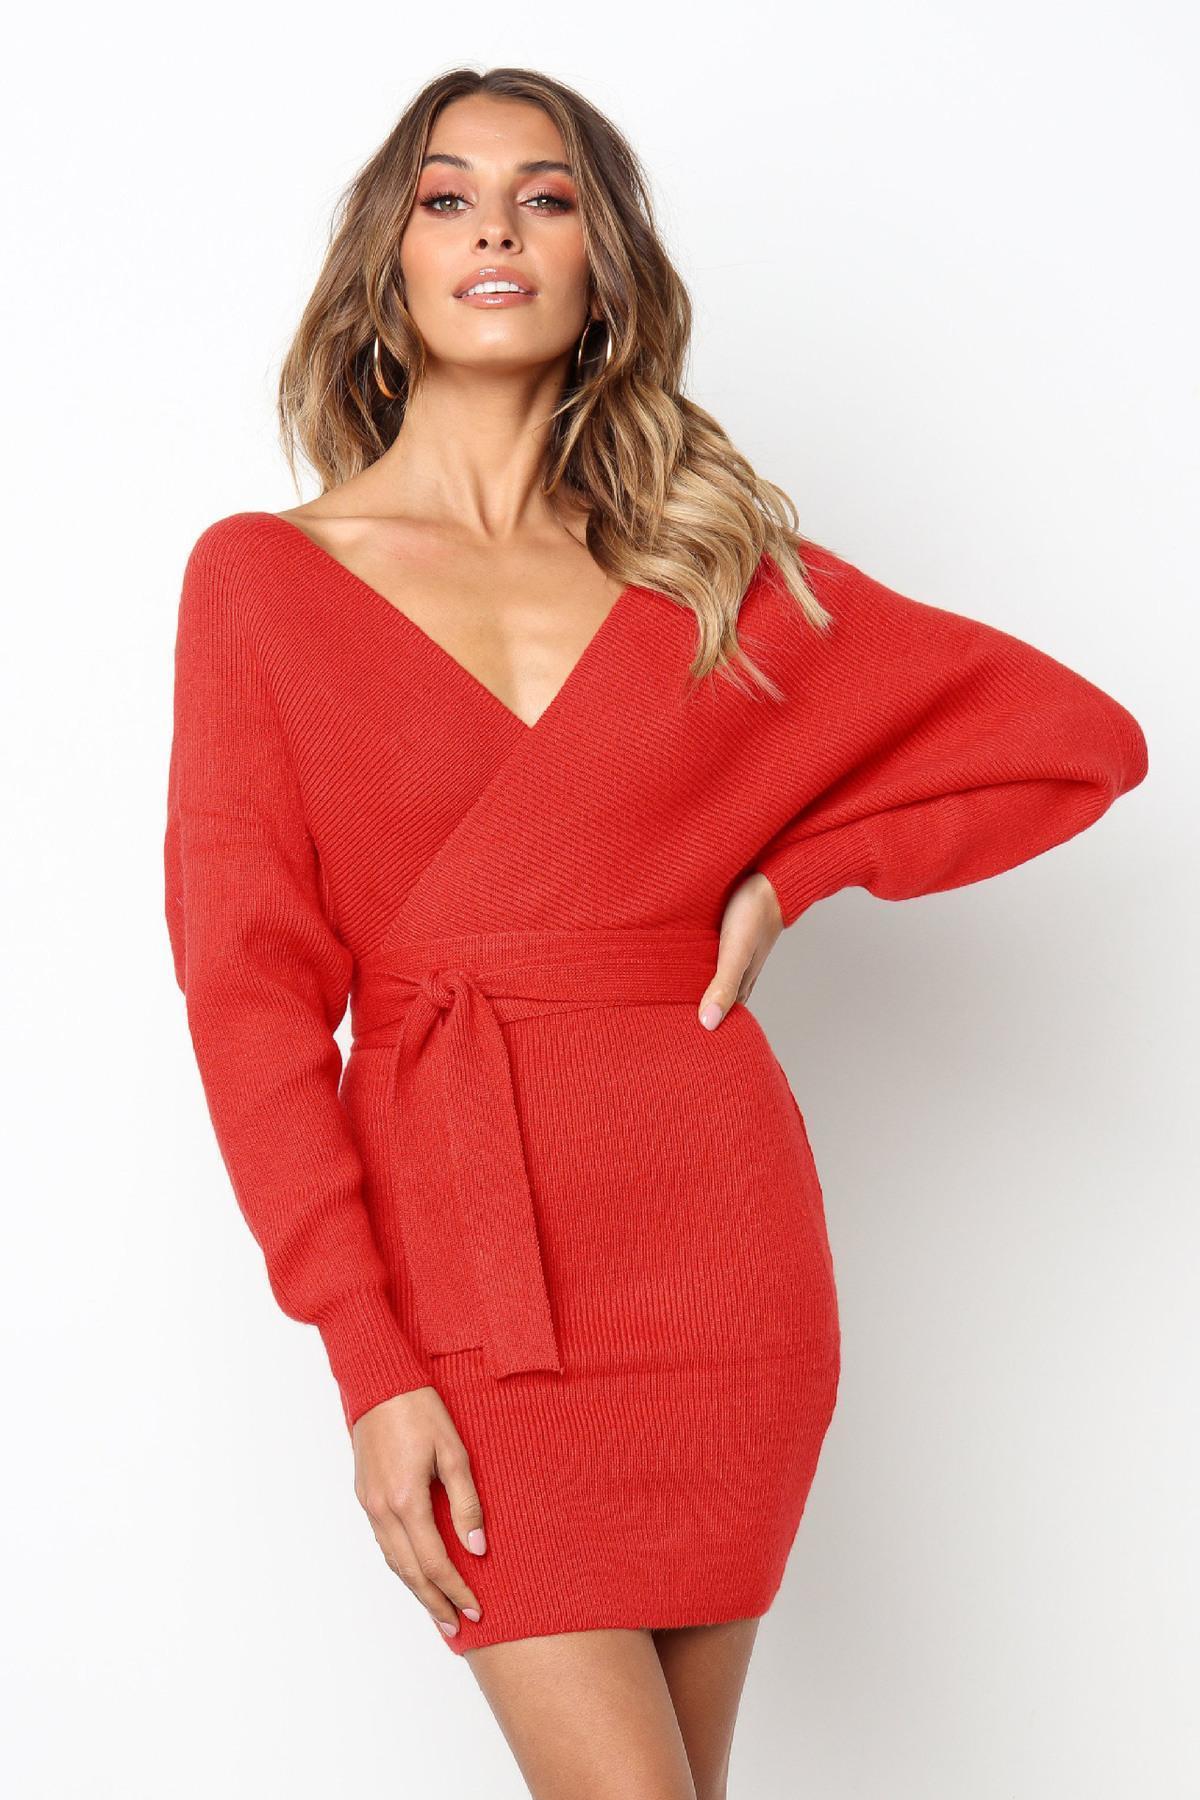 Good Quality Women S Dress Autumn 2019 Sexy Deep V Neck Long Sleeved Cross Lace  Dress Women S Knitting Bandage Mini Hip Dress Red Long Dress For Summer ... bae9a85104